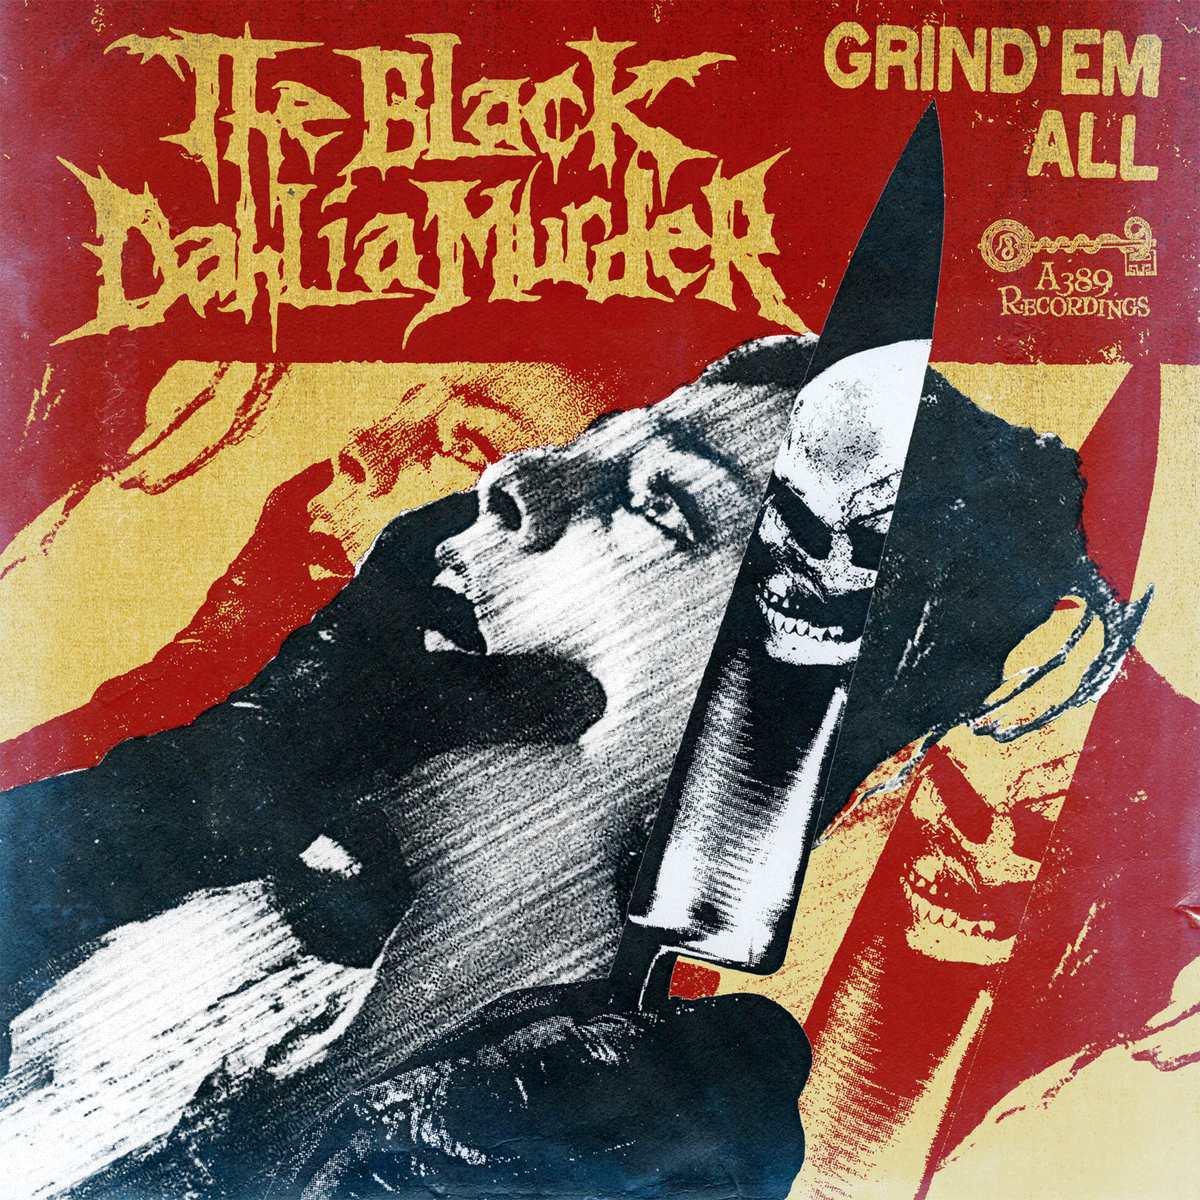 The Black Dahlia Murder - Grind 'Em All